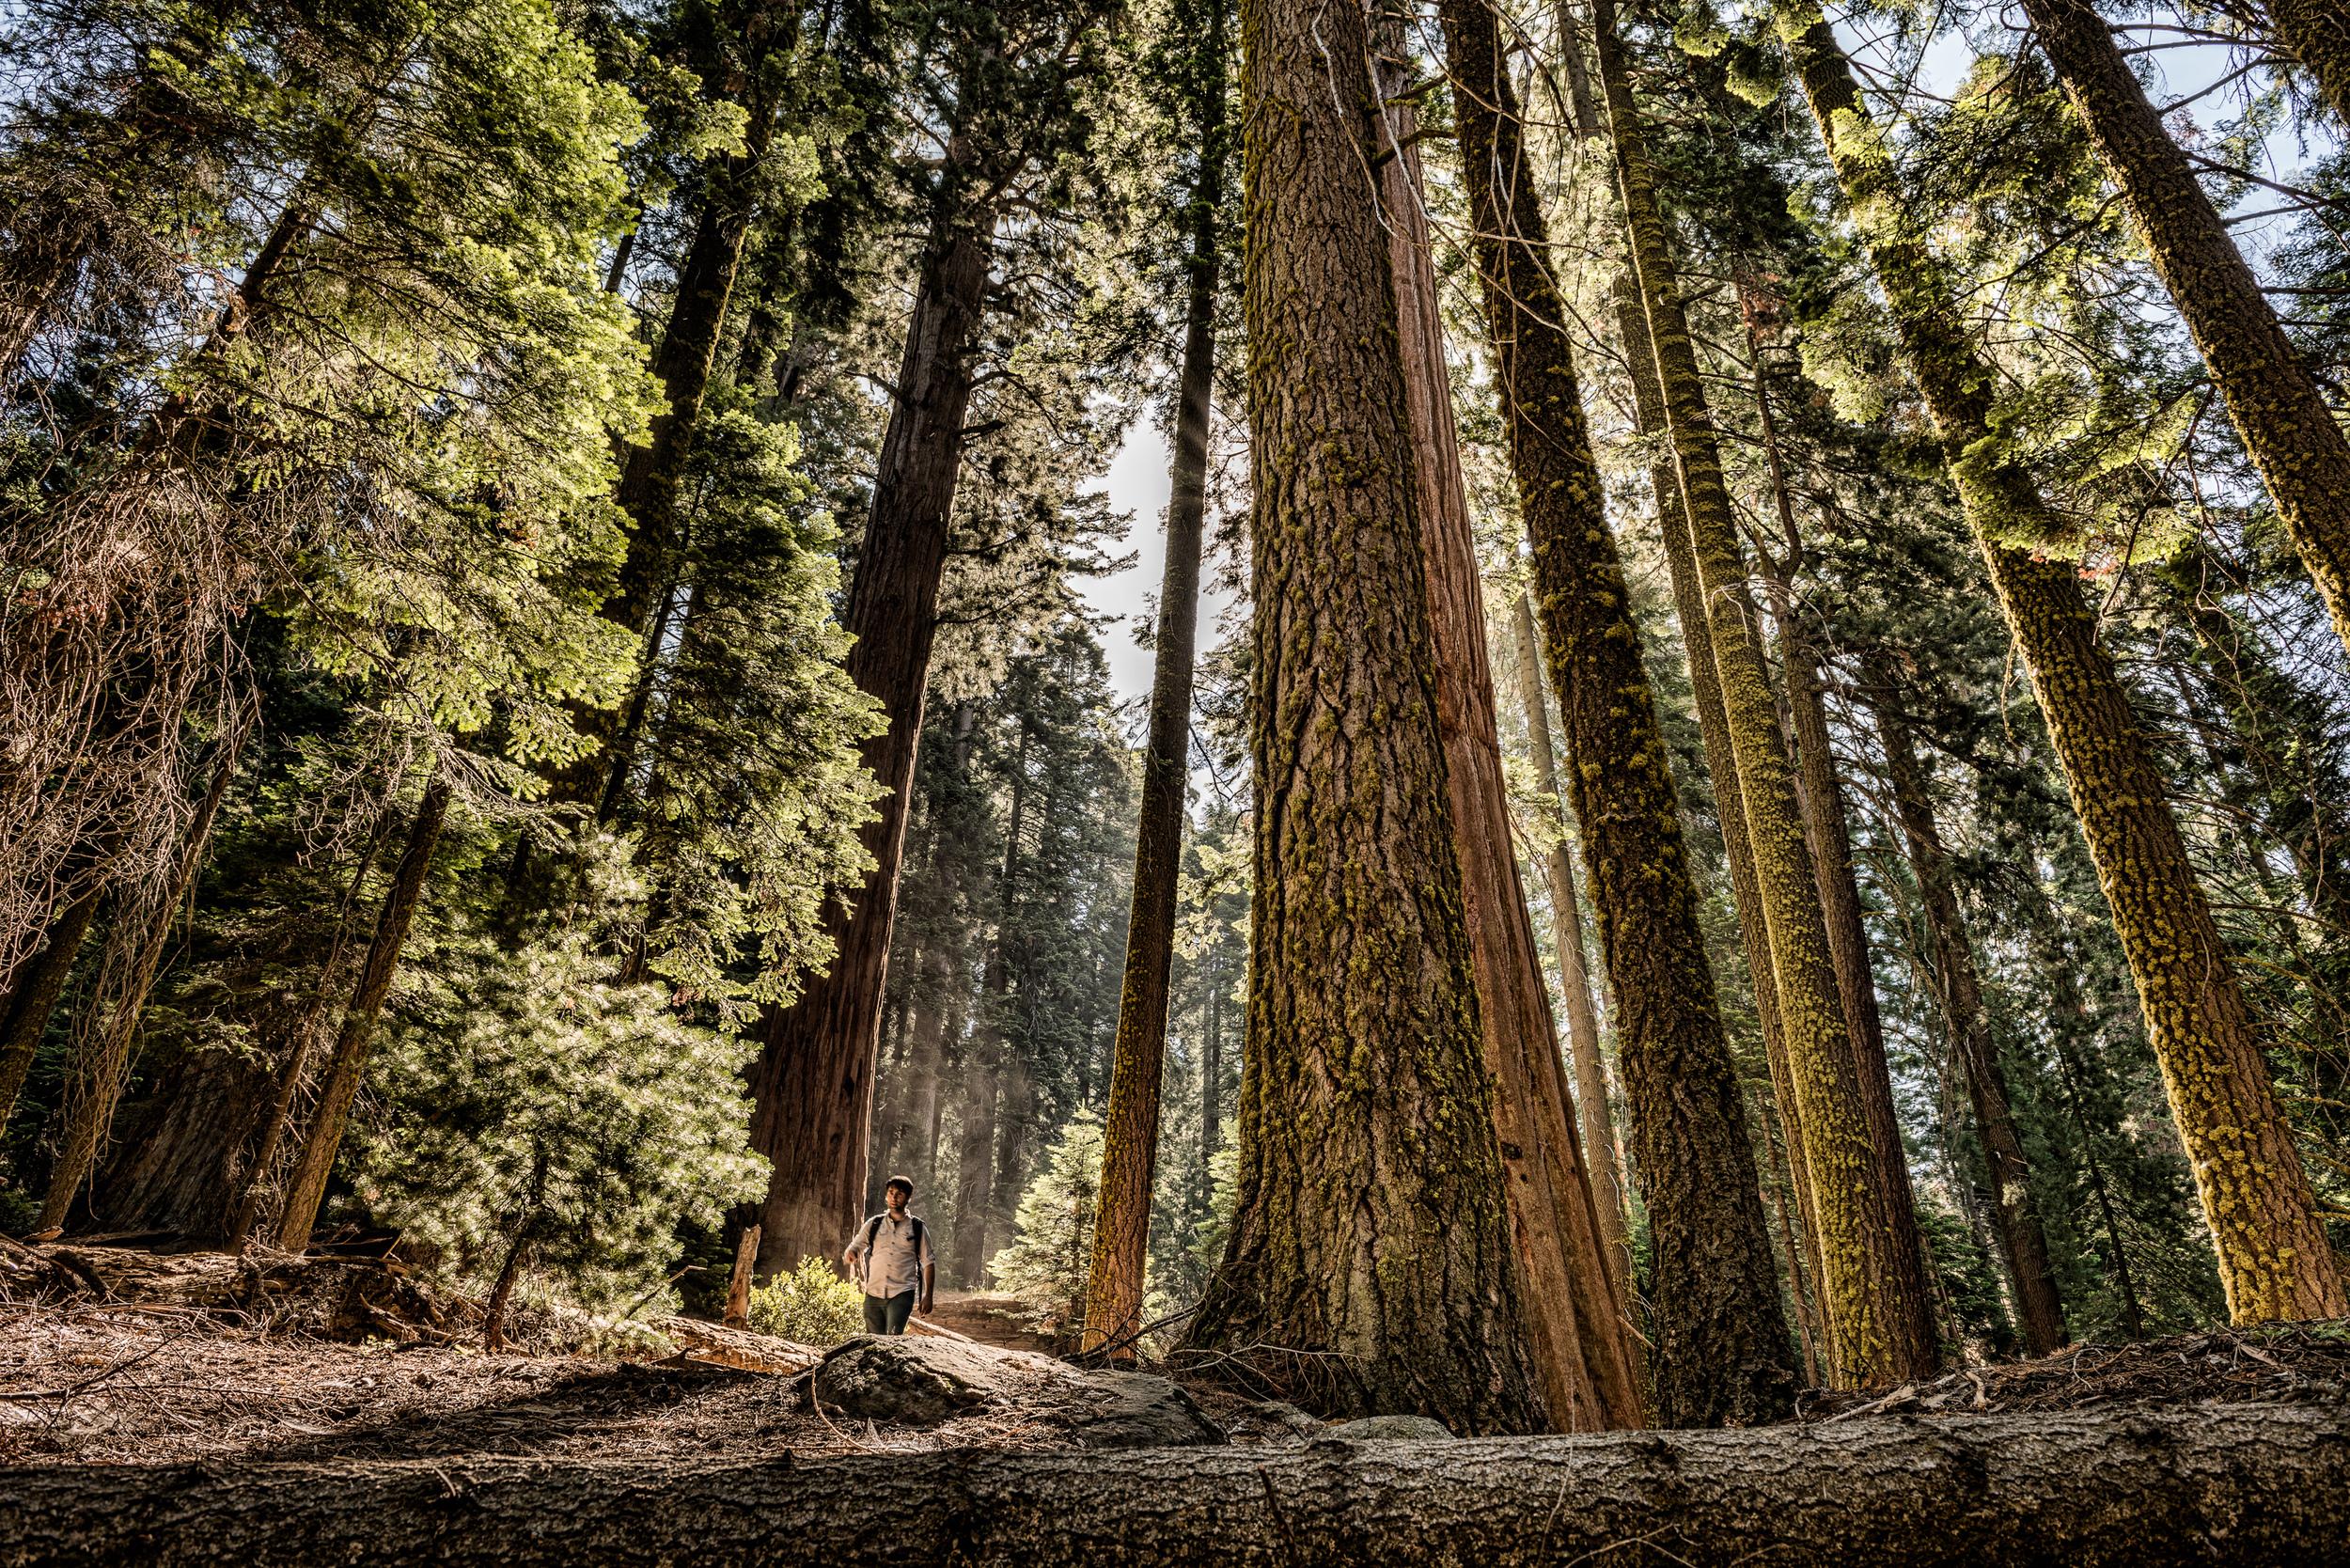 TP_Redwoods-0250-Edit-2.jpg